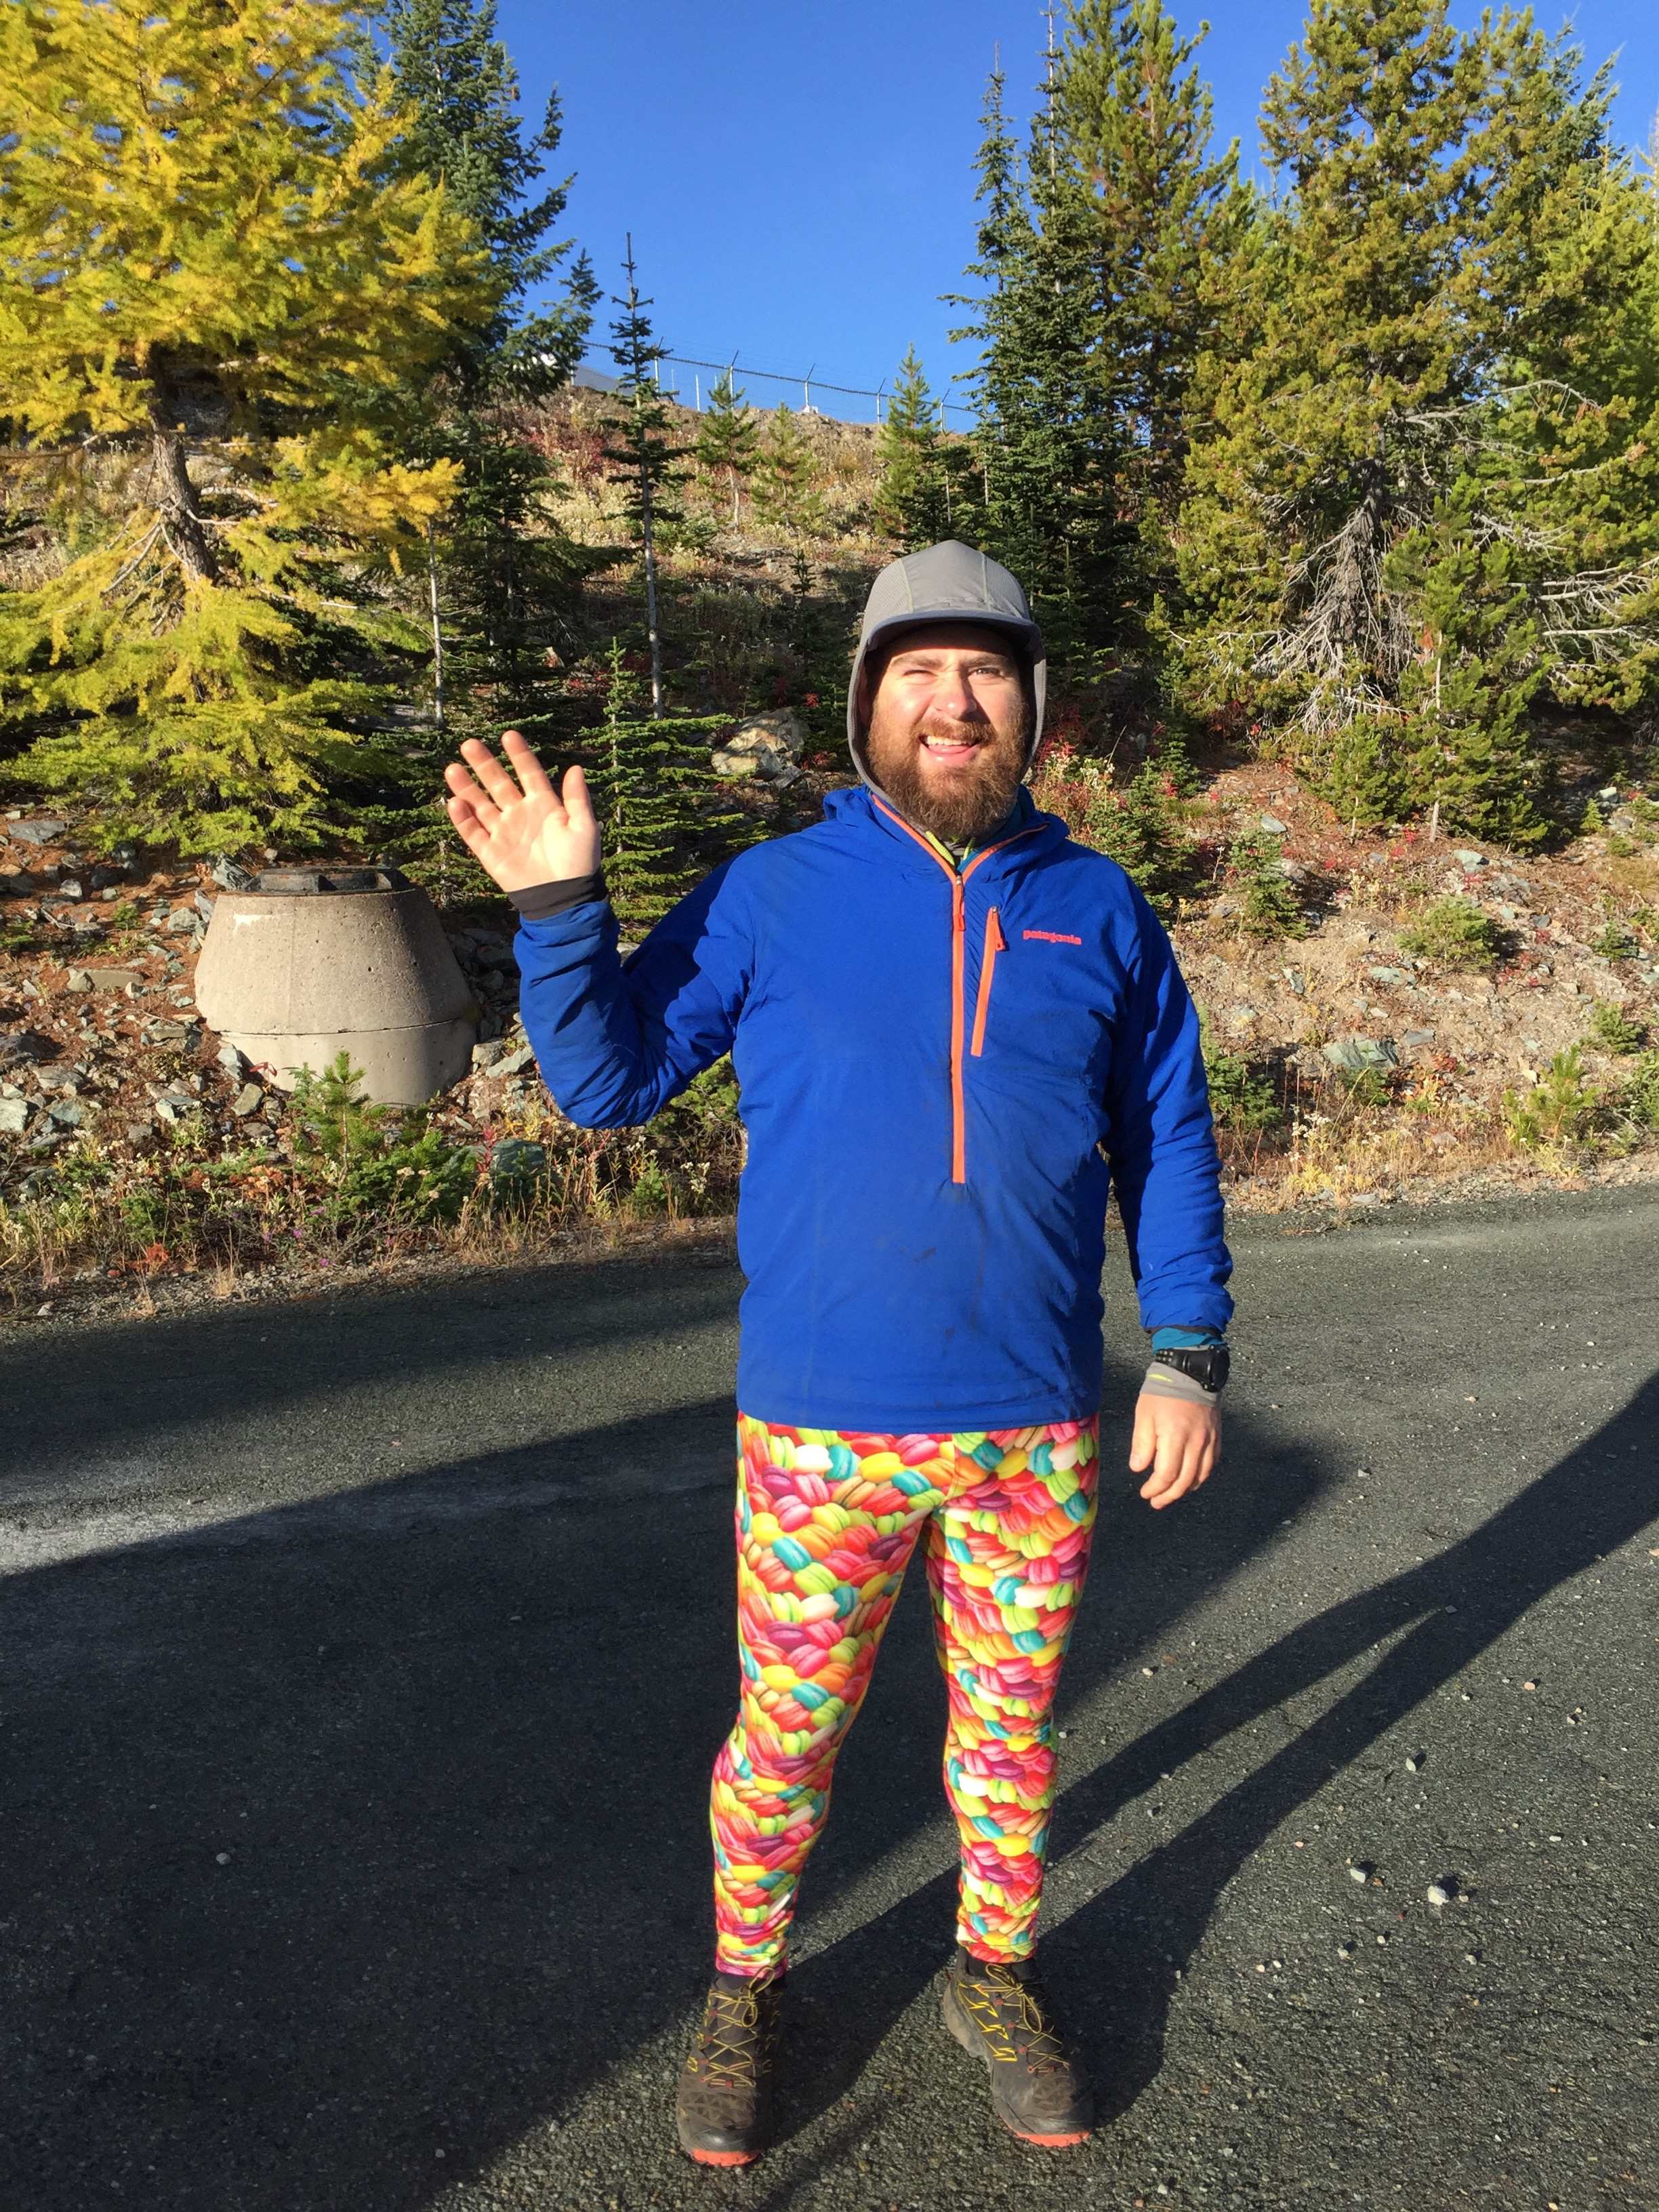 foys to blacktail trails trail marathon ftbtIMG_1056.JPG